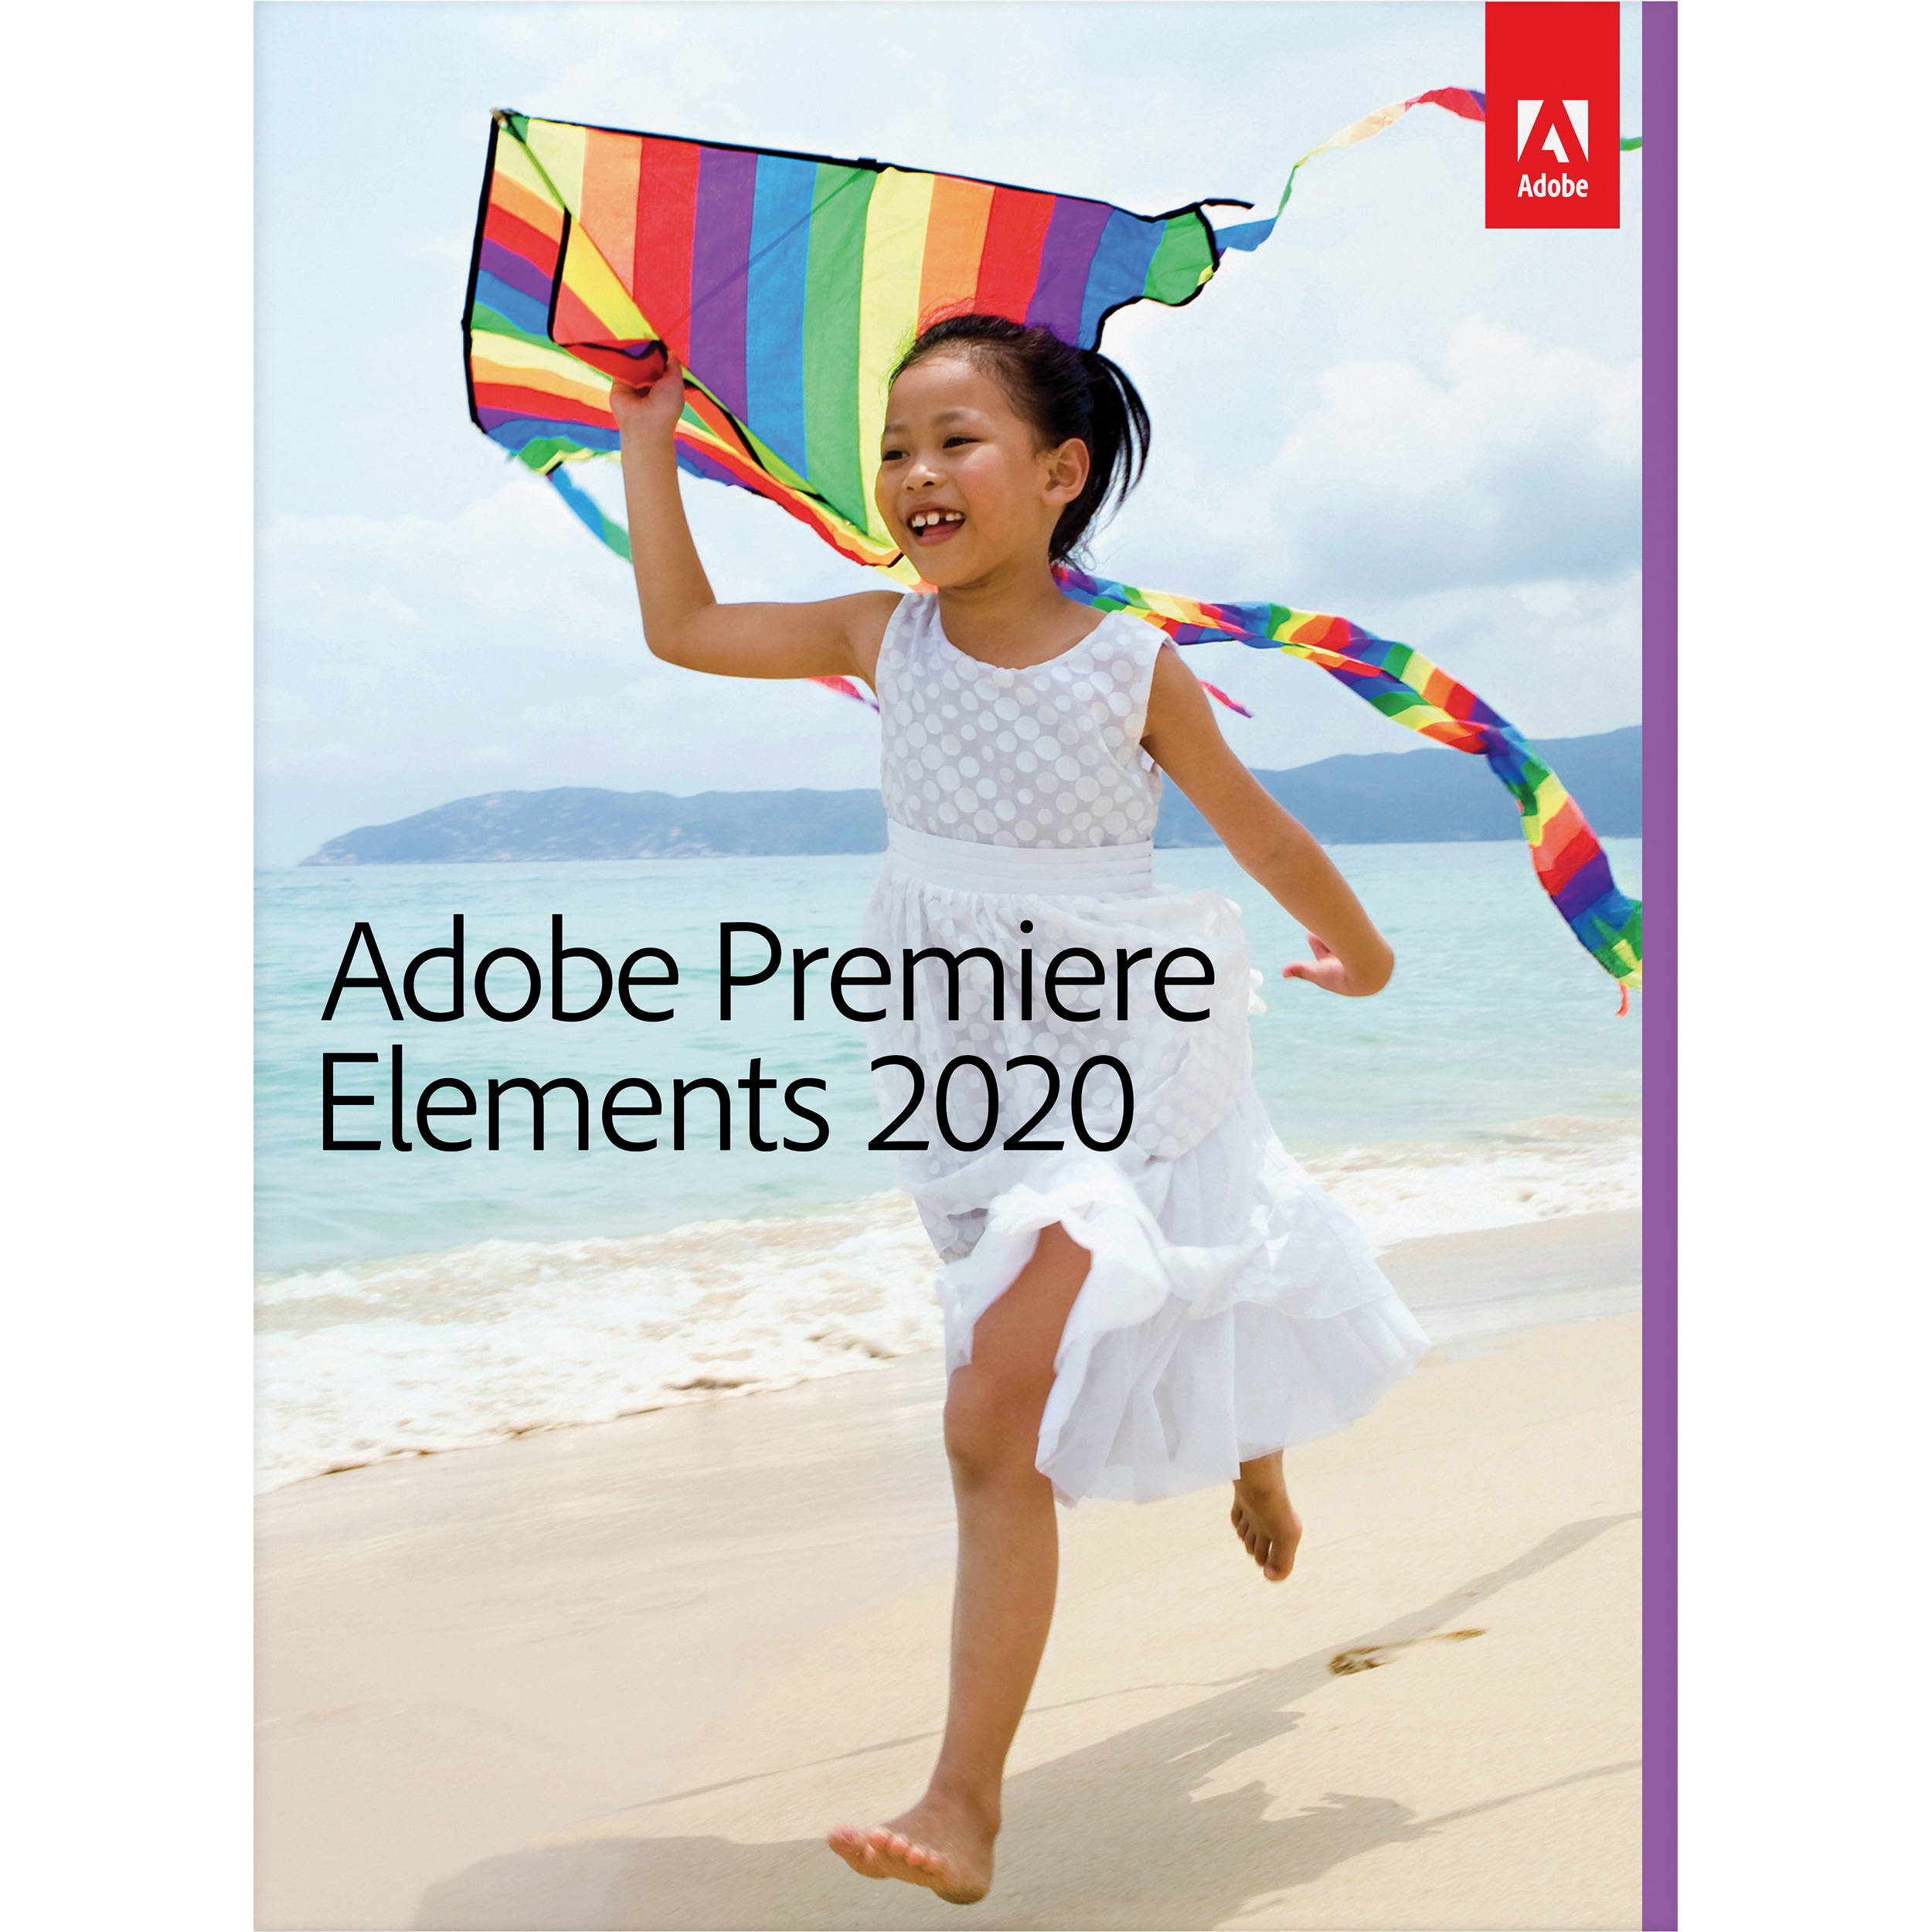 Adobe Premiere Elements 2020 Licenta Perpetua Electronica 1 utilizator